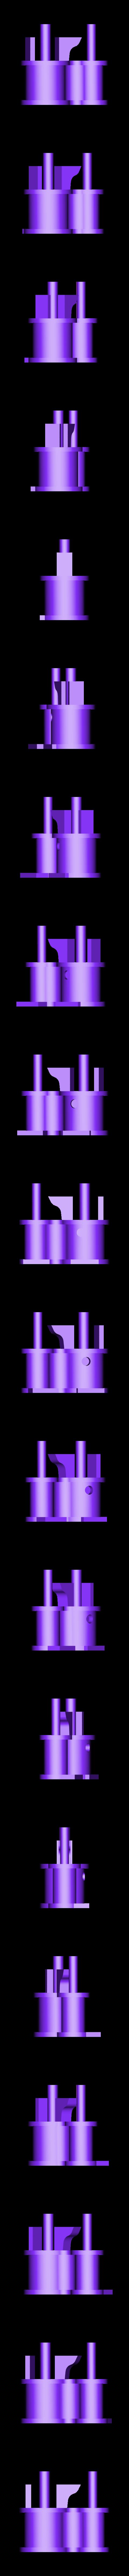 air_Pump-b.STL Download free STL file 4-8-8-4 Big Boy Locomotive • 3D printer object, RaymondDeLuca